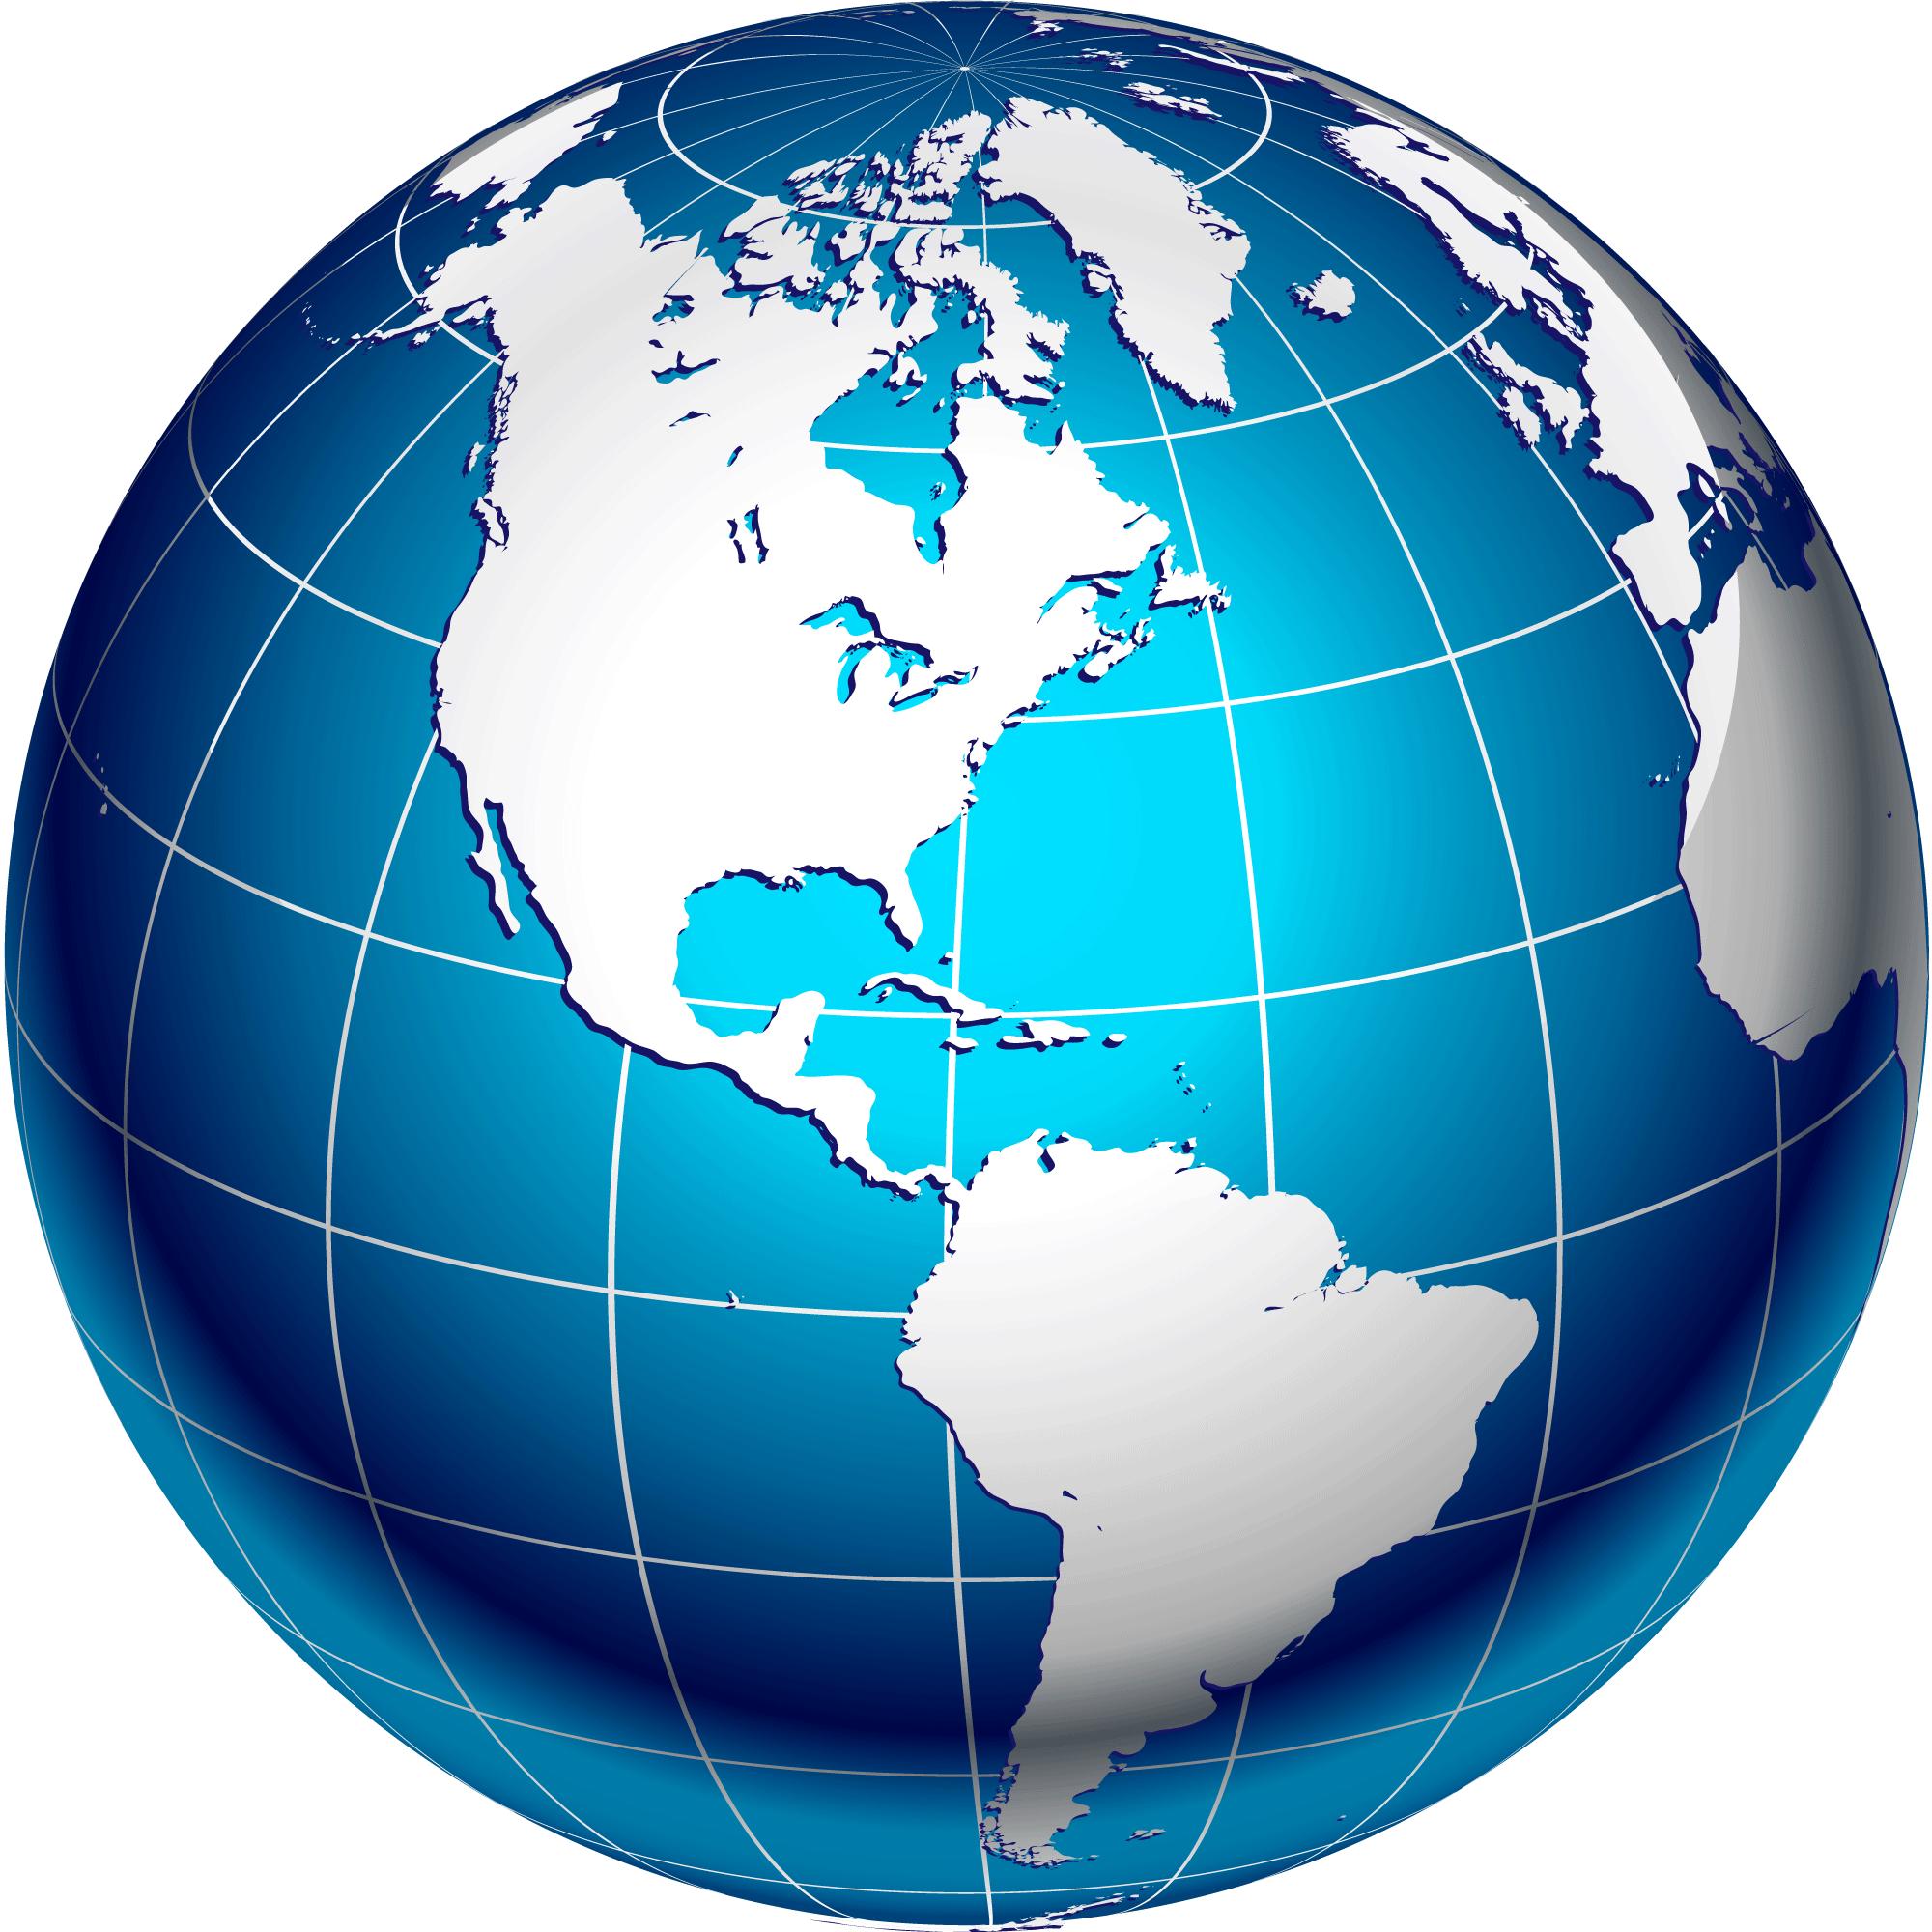 Globe Png Hd image #39519